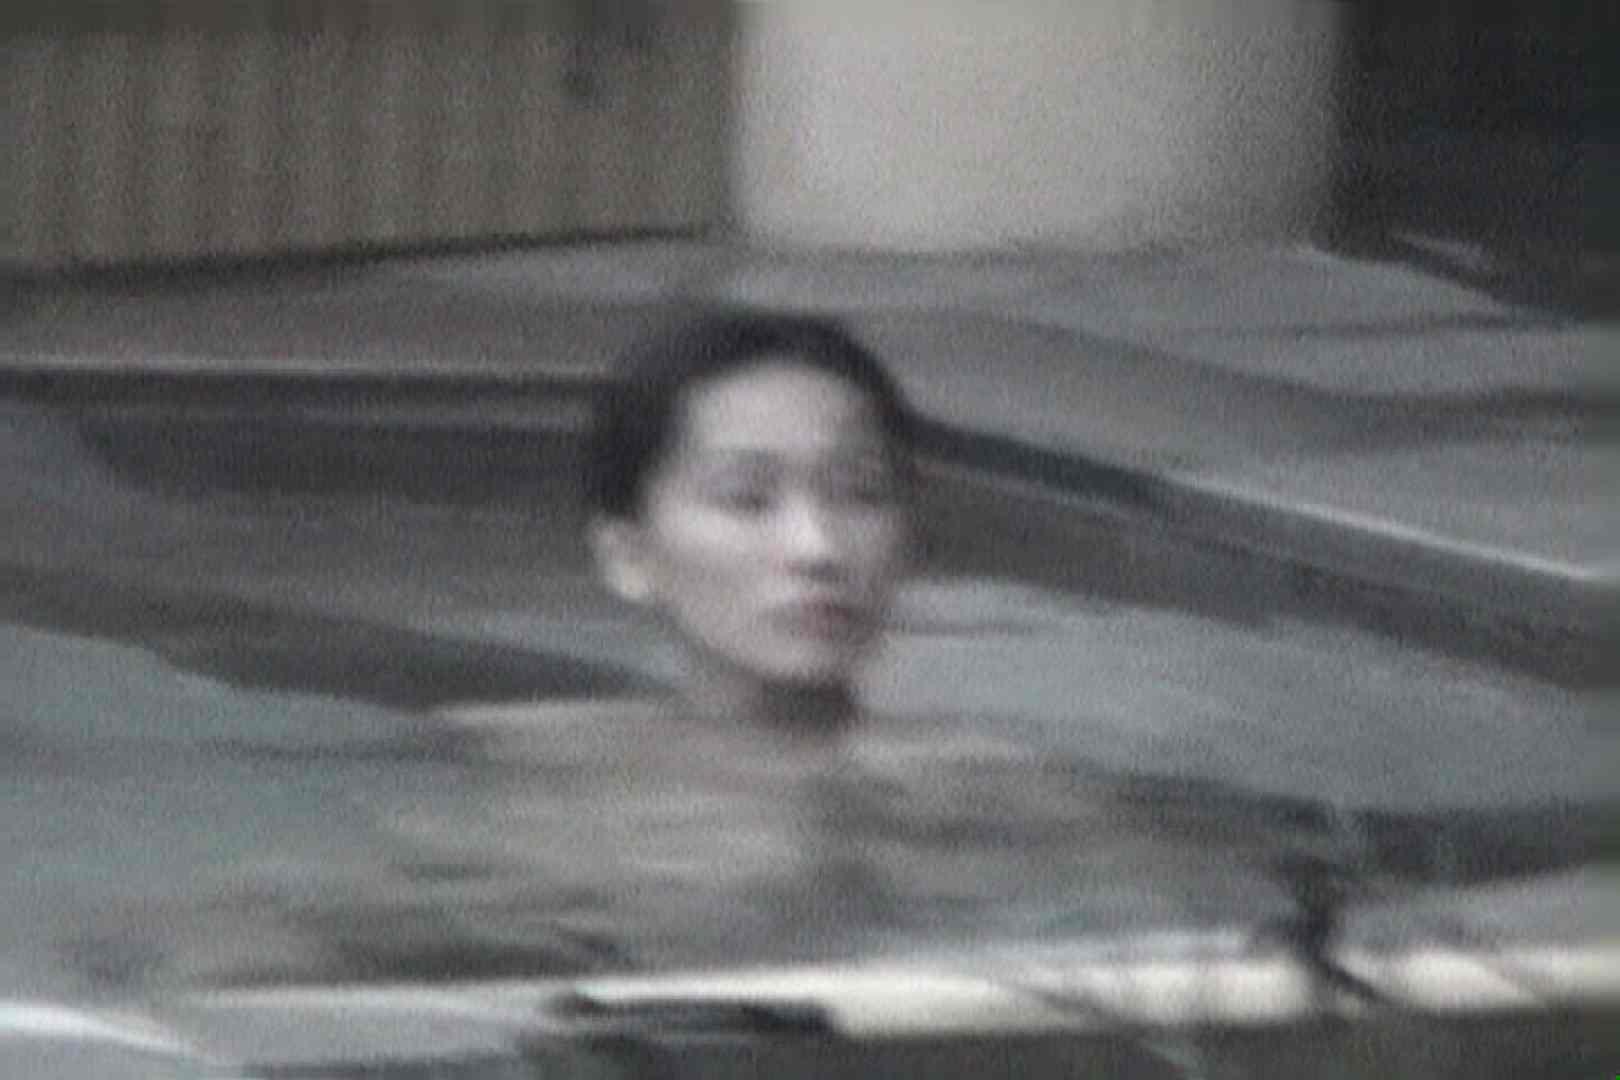 Aquaな露天風呂Vol.557 露天風呂編  100PIX 4